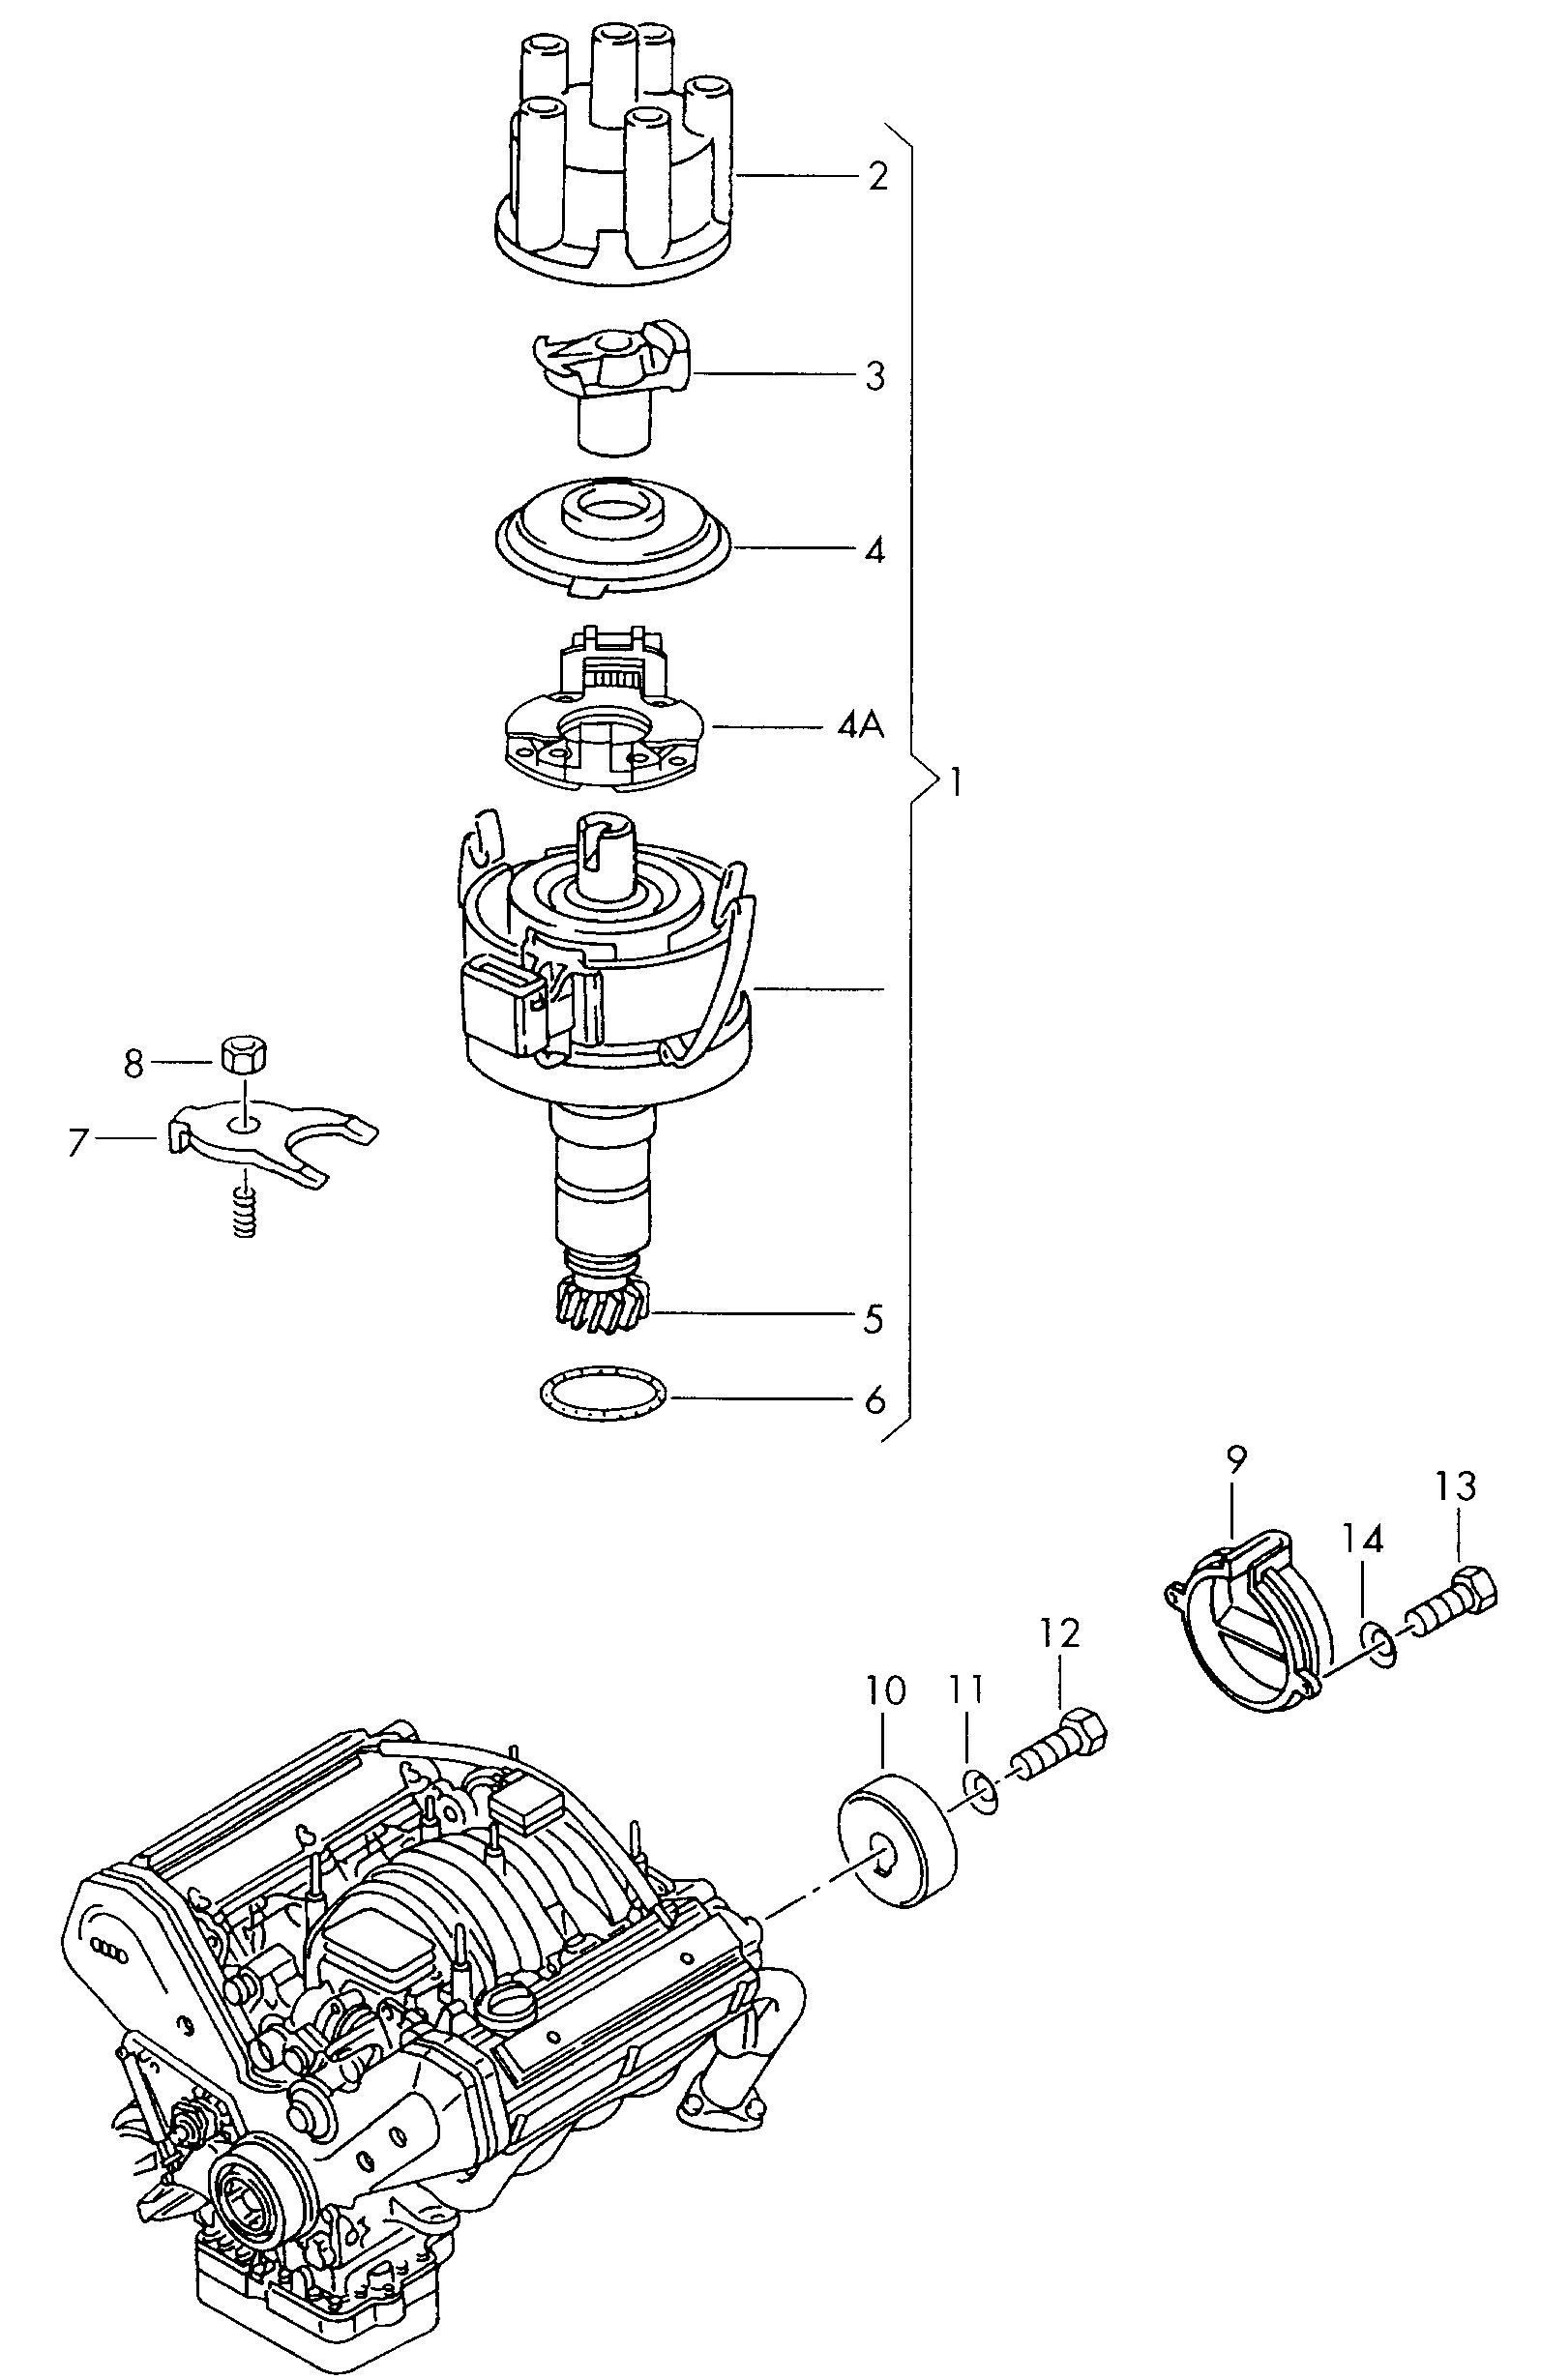 Audi Ur Quattro Wiring Diagram. . Wiring Diagram Weathertron Trane Wiring Diagram Thermostat Aat B A on